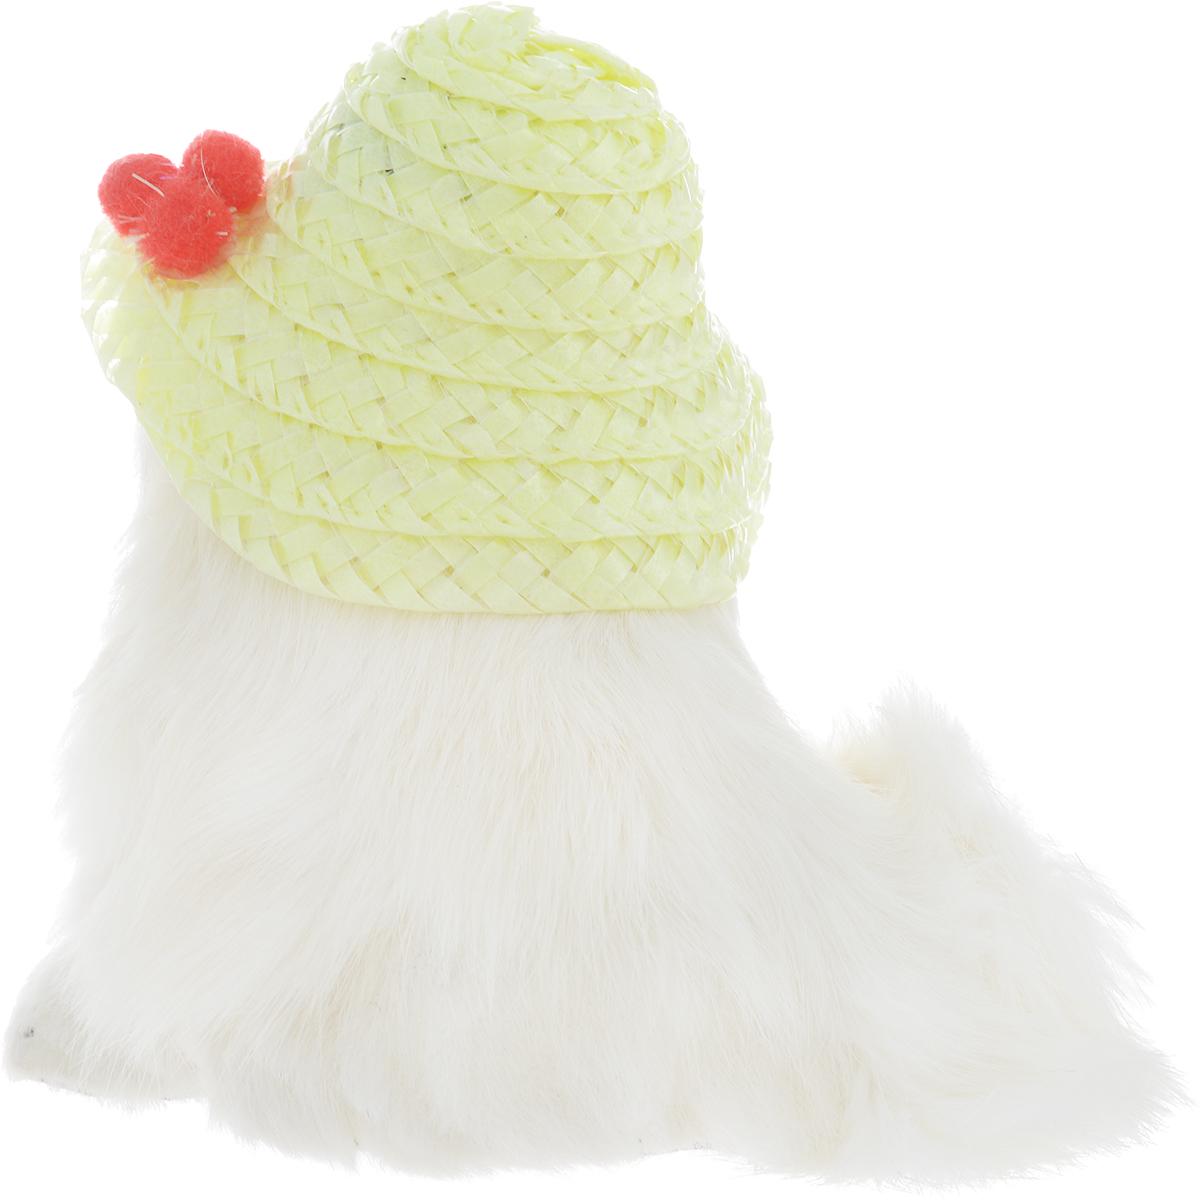 VebtoyФигурка Котенок в шляпке цвет белый